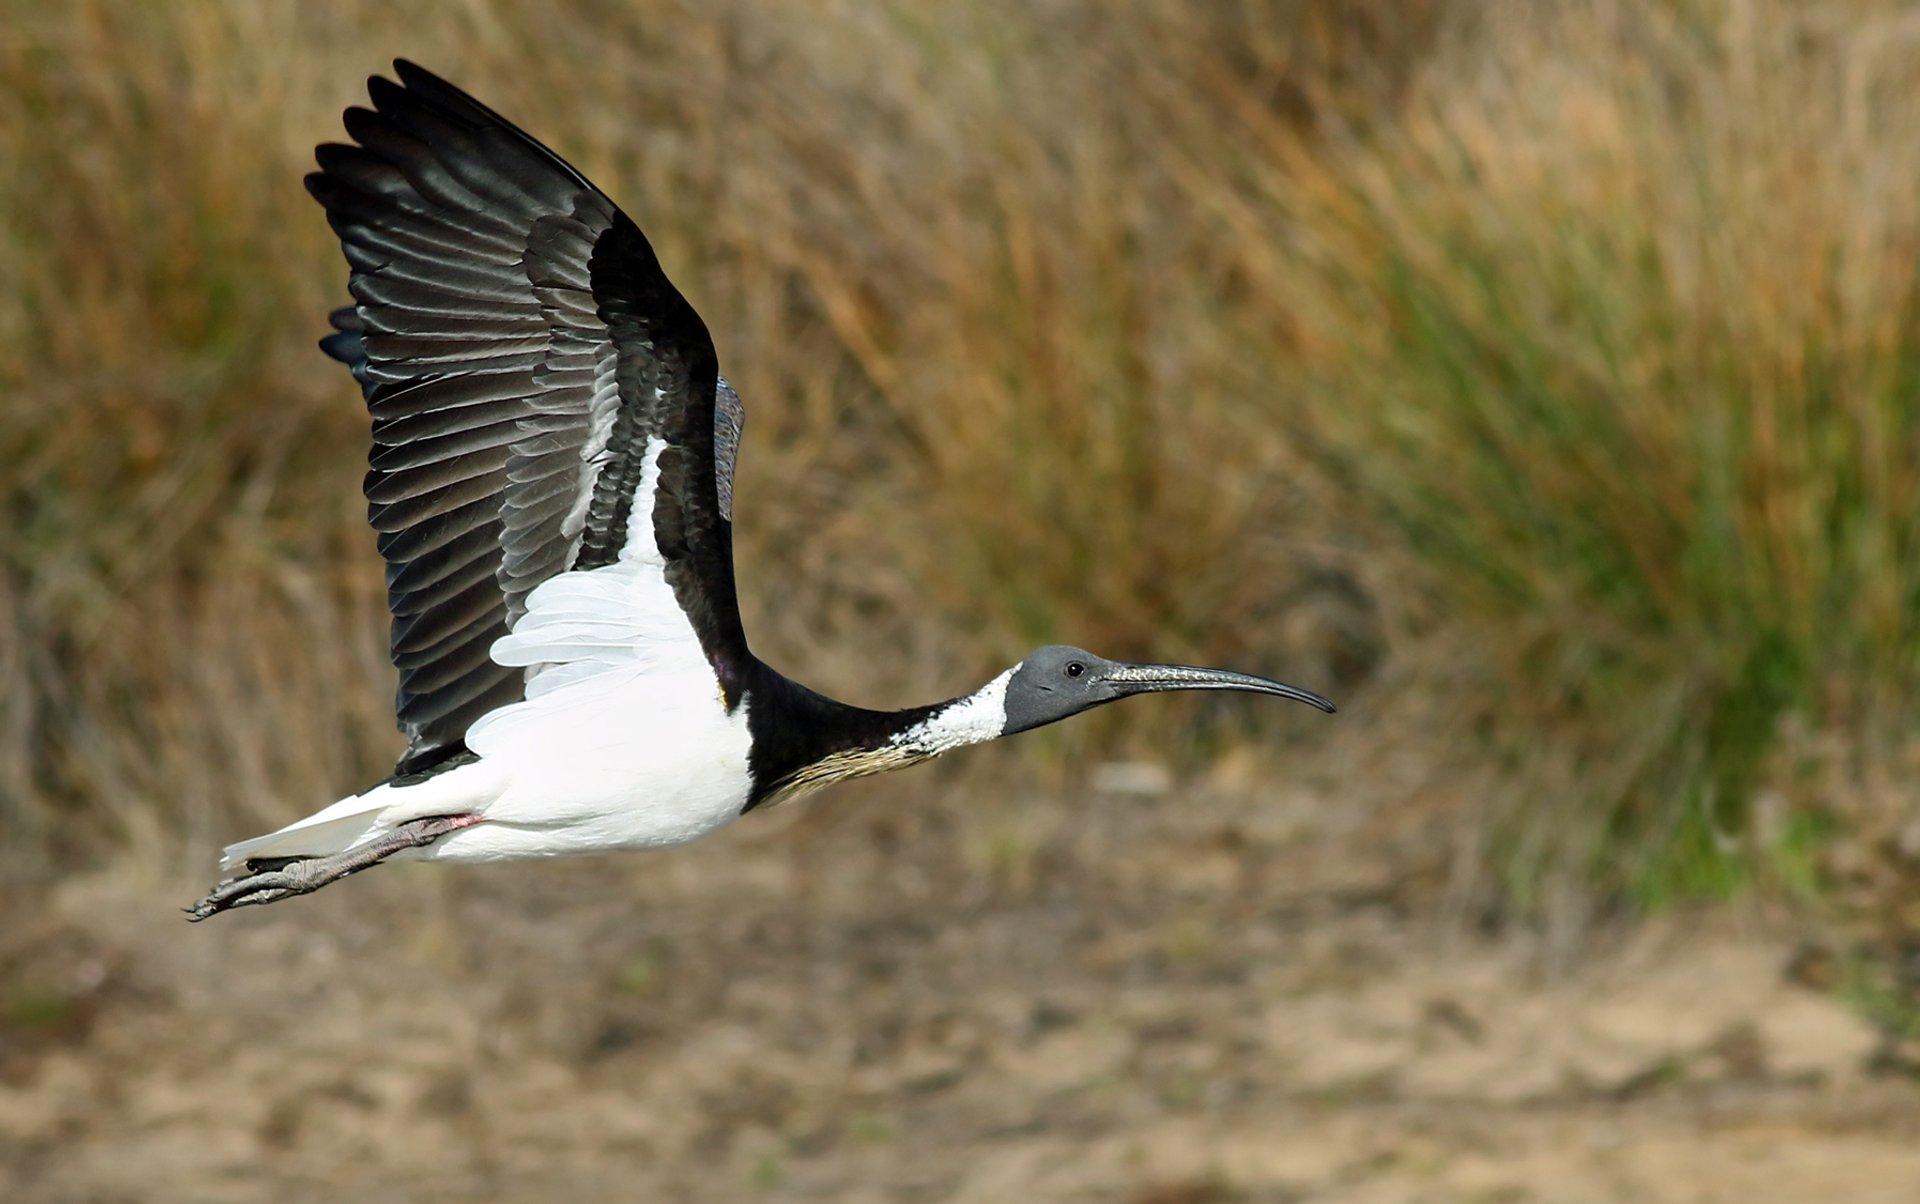 Straw-necked ibis 2020